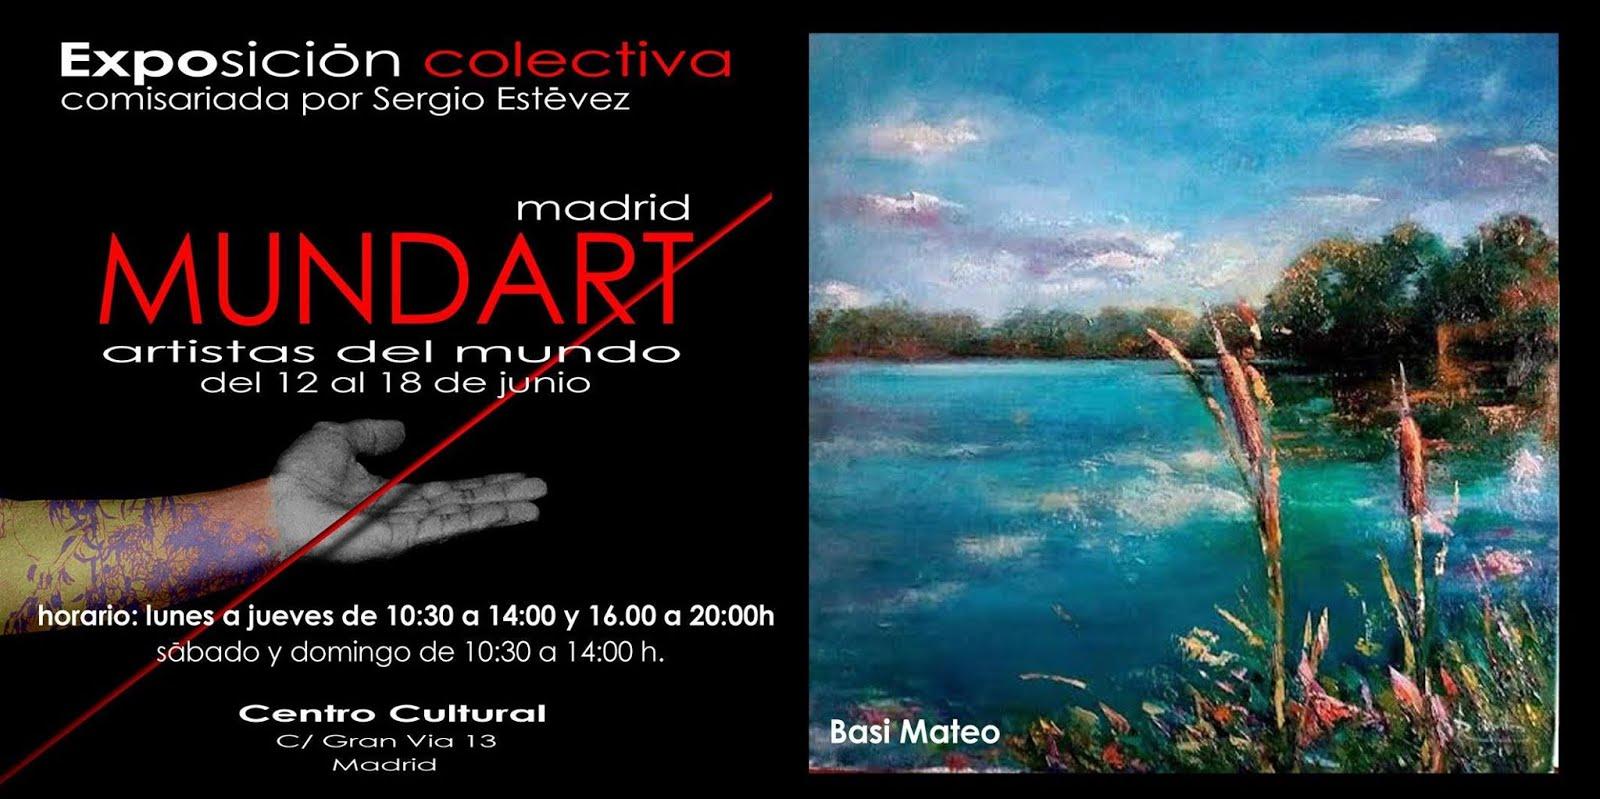 MUNDART MADRID